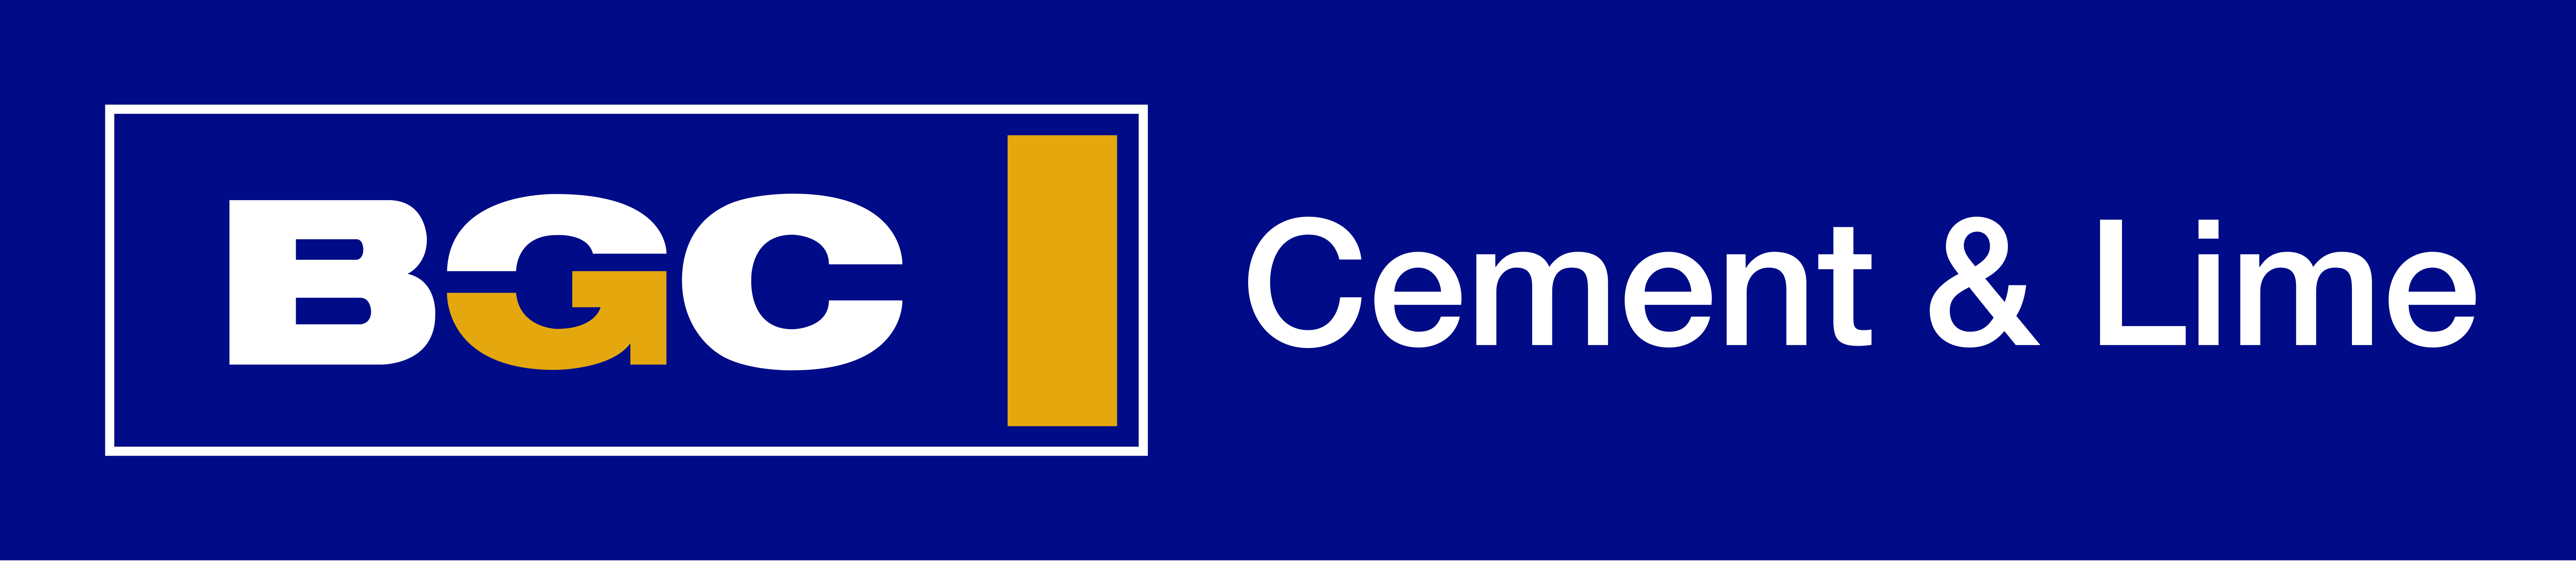 BGC Cement & Lime